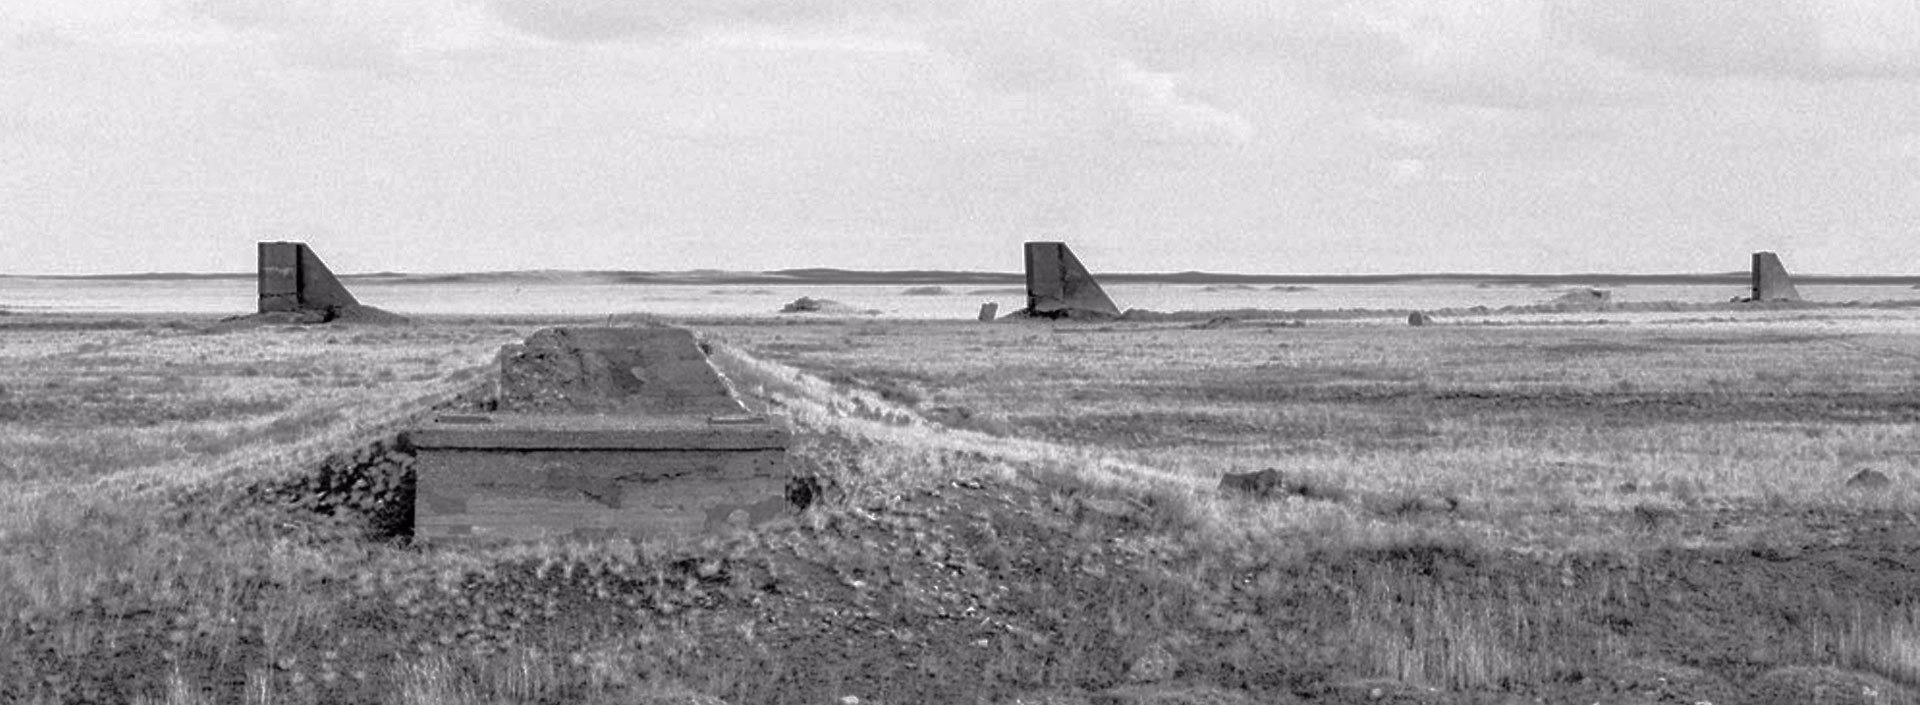 Opytnoe Pole. Semipalatinsk nuclear test site. Kazakhstan - Ursula Schulz-Dornburg